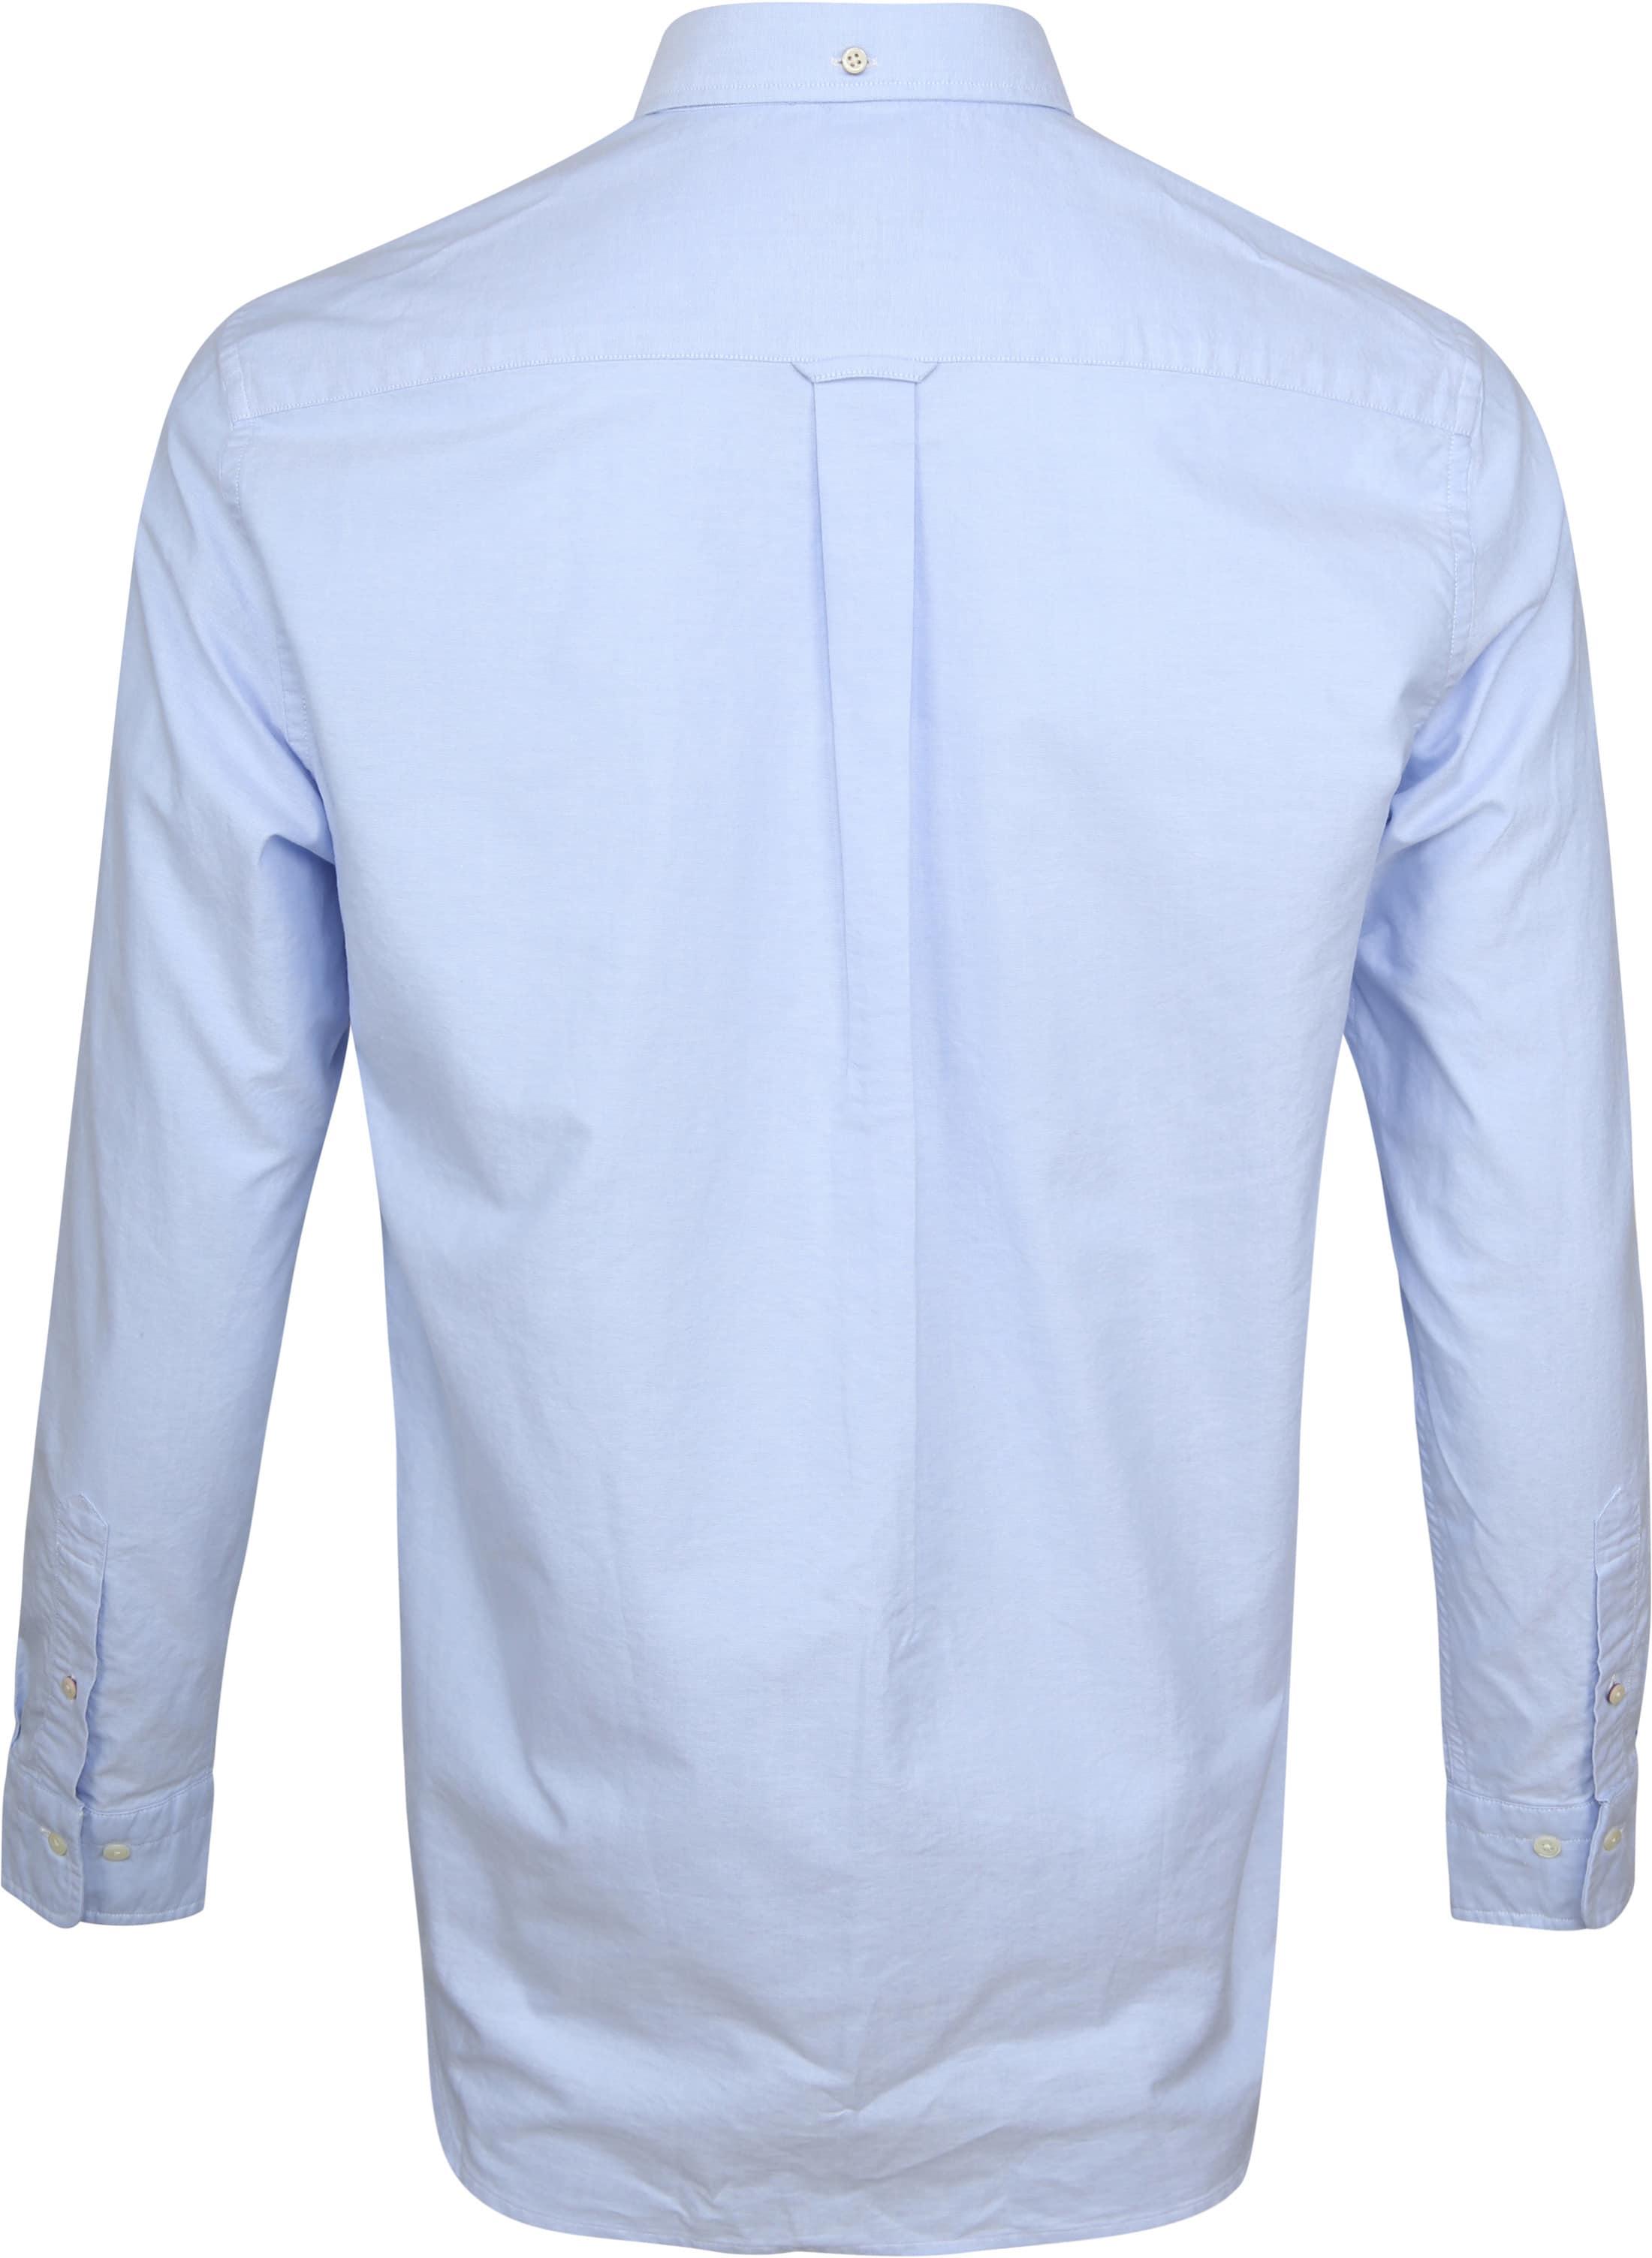 Gant Casual Overhemd Oxford Lichtblauw foto 3